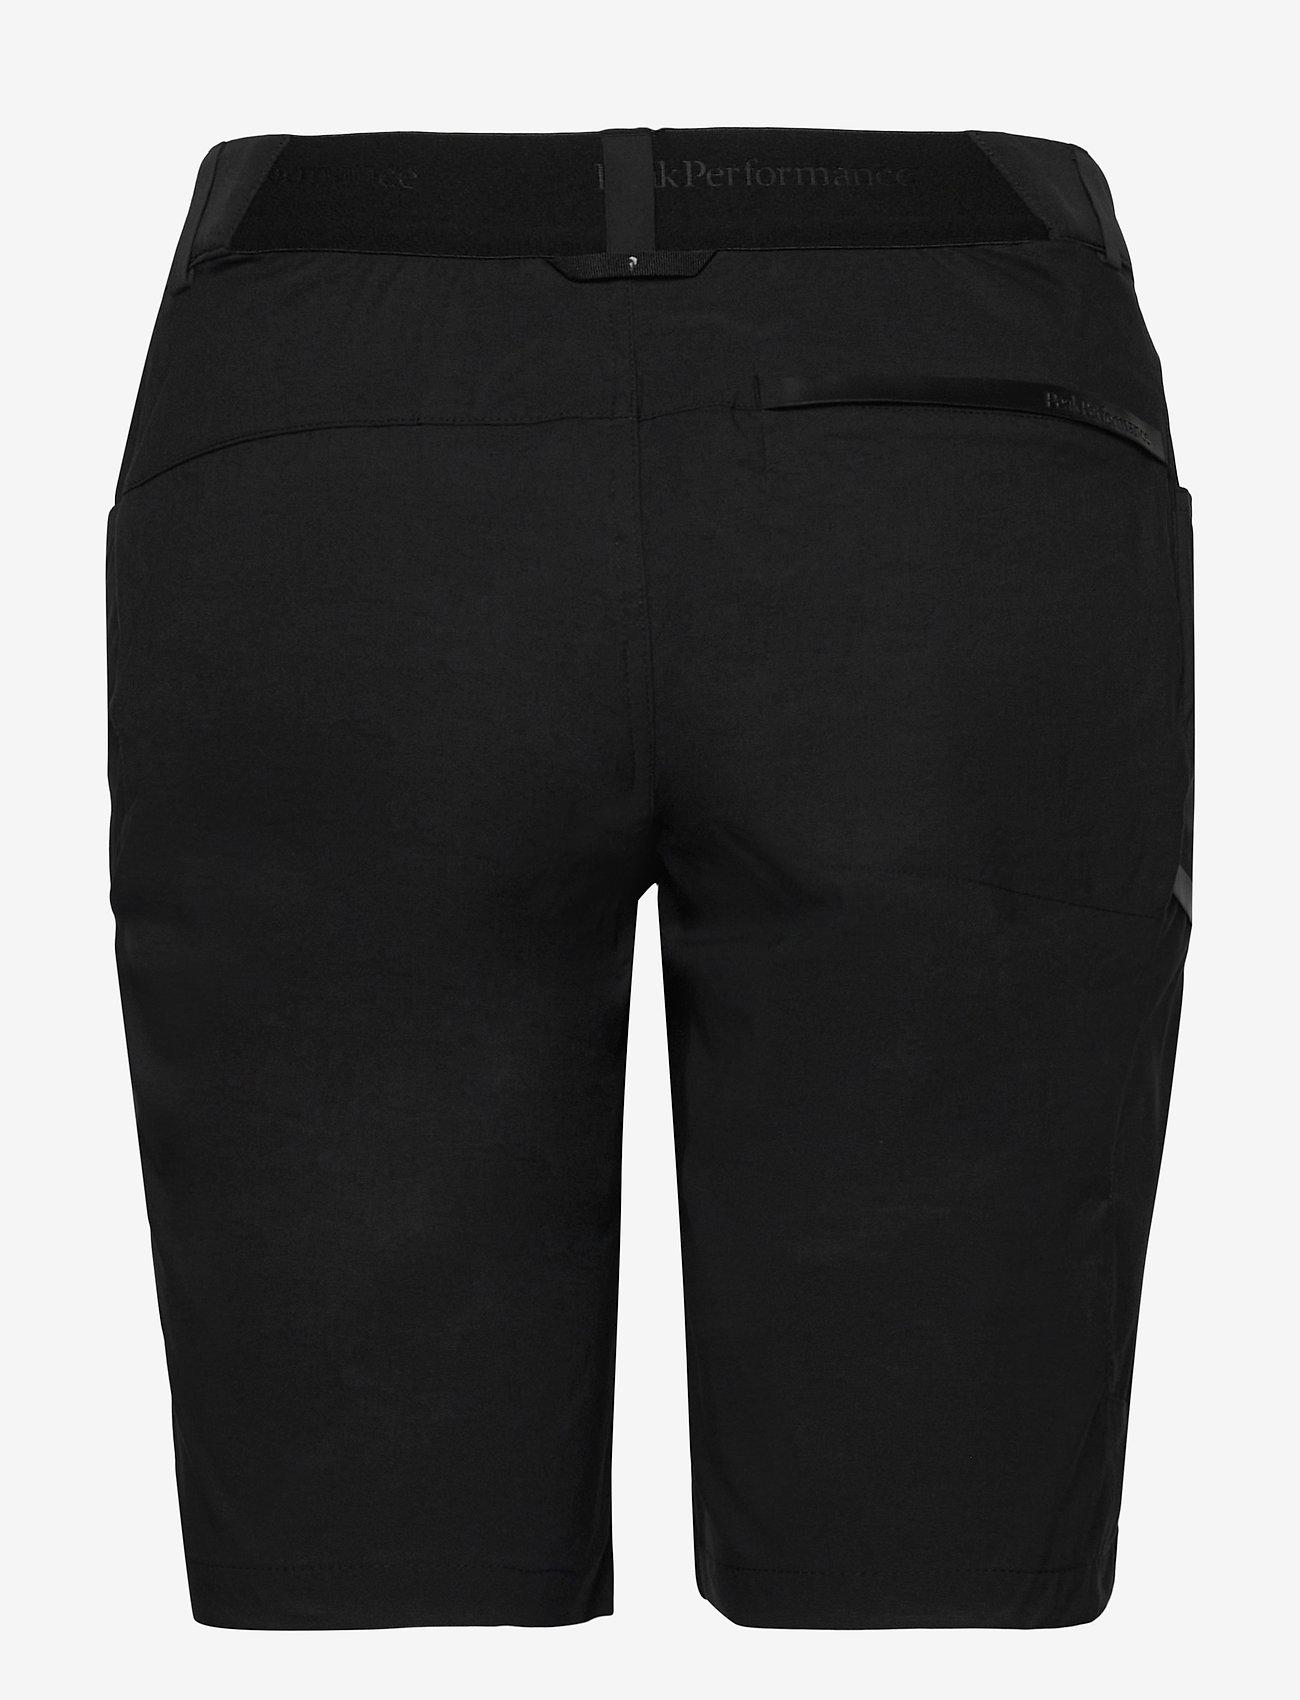 Peak Performance - W Iconiq Long shorts - short de randonnée - black - 1